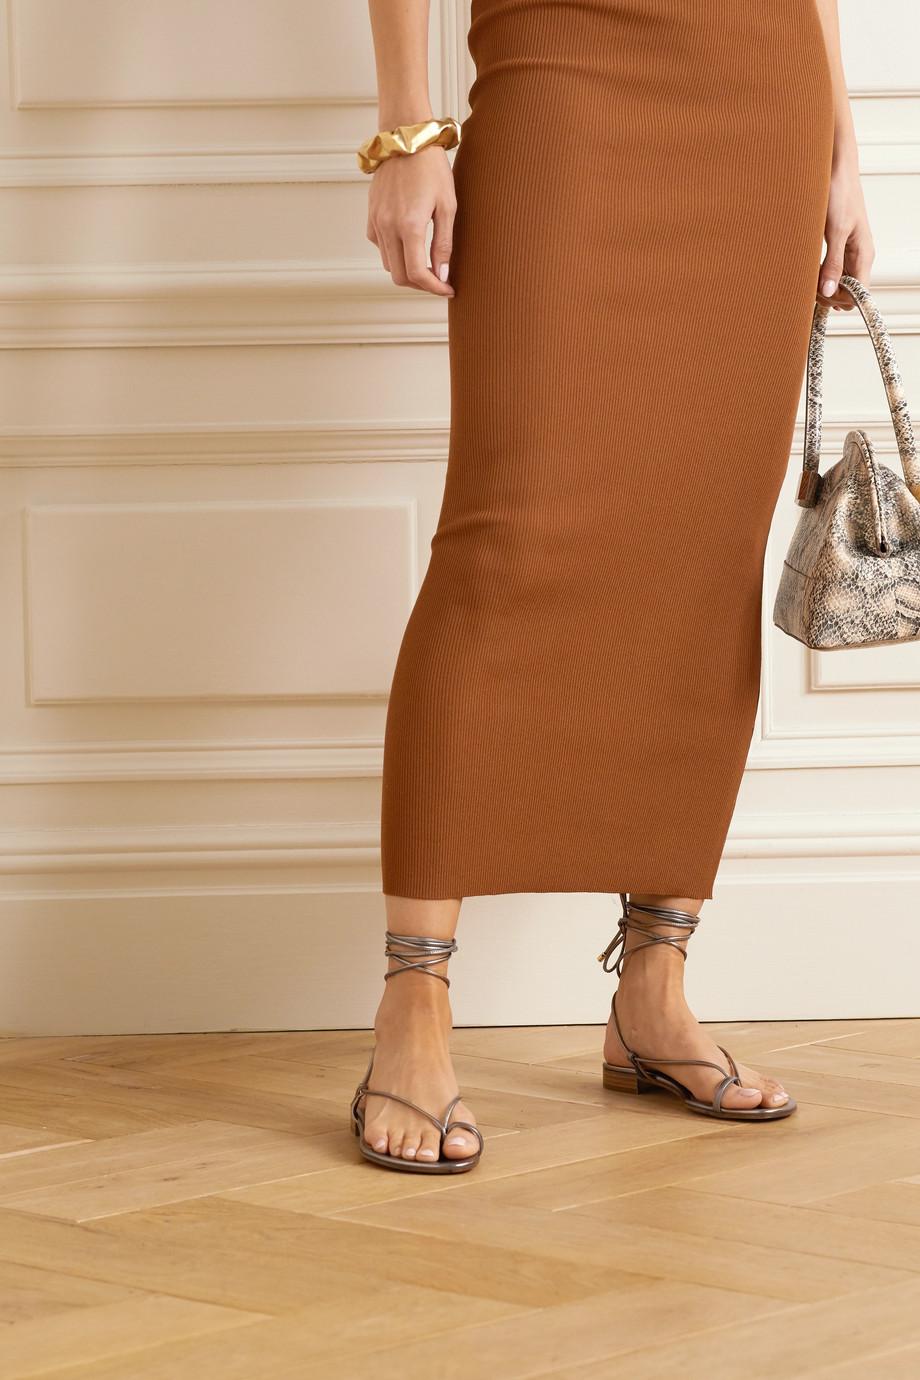 Emme Parsons Ava 金属感皮革凉鞋